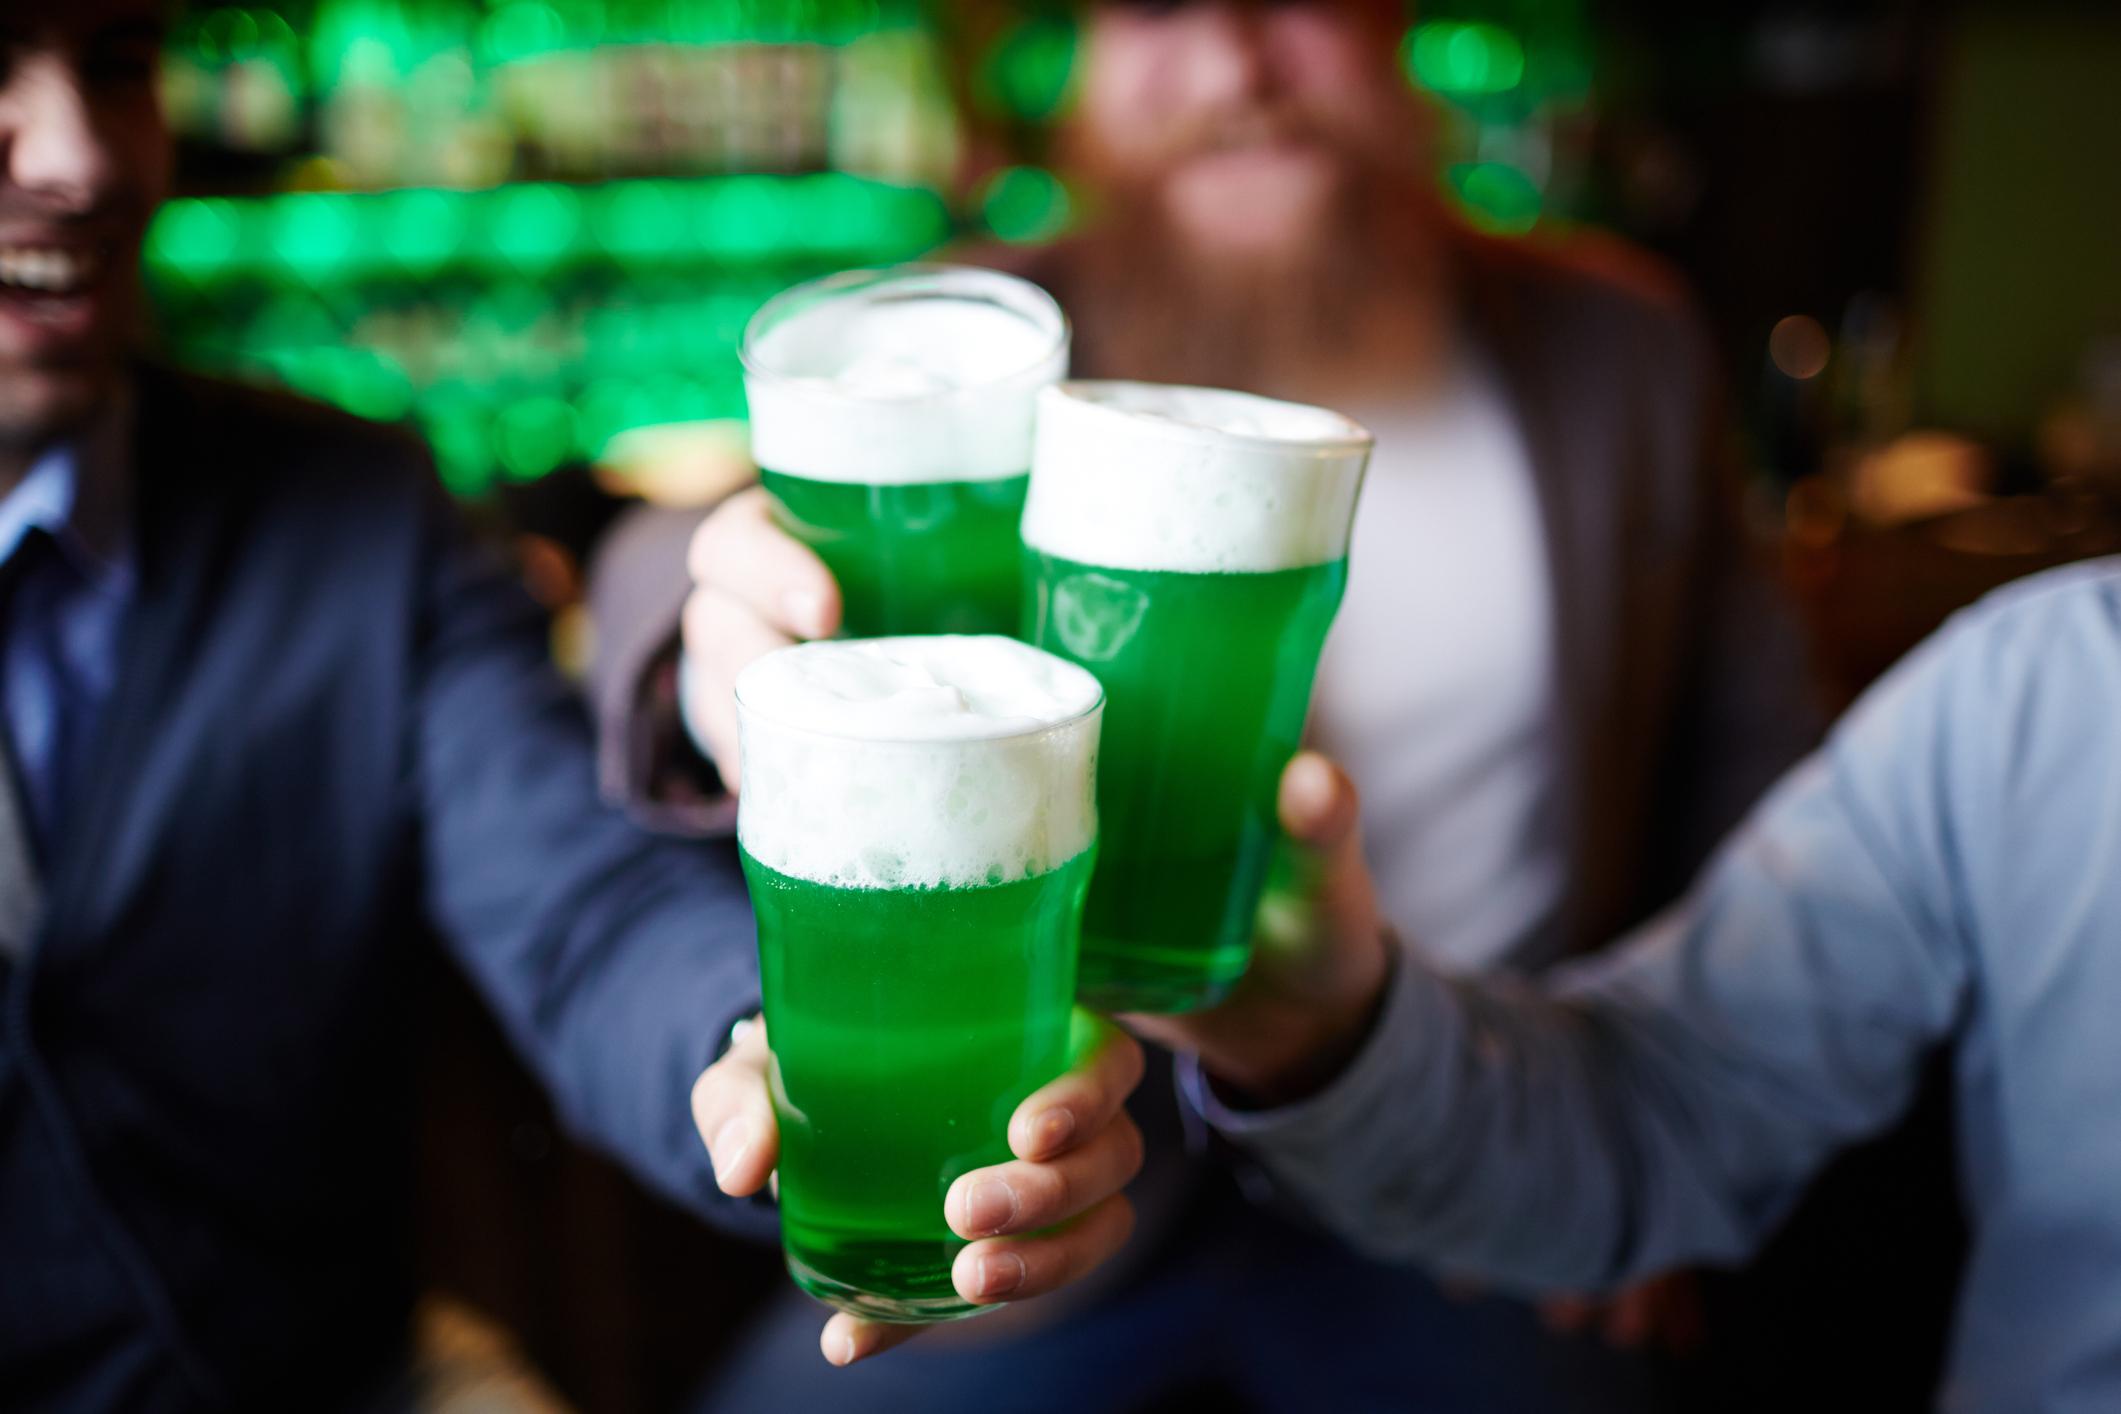 cheersing a pint of green beer